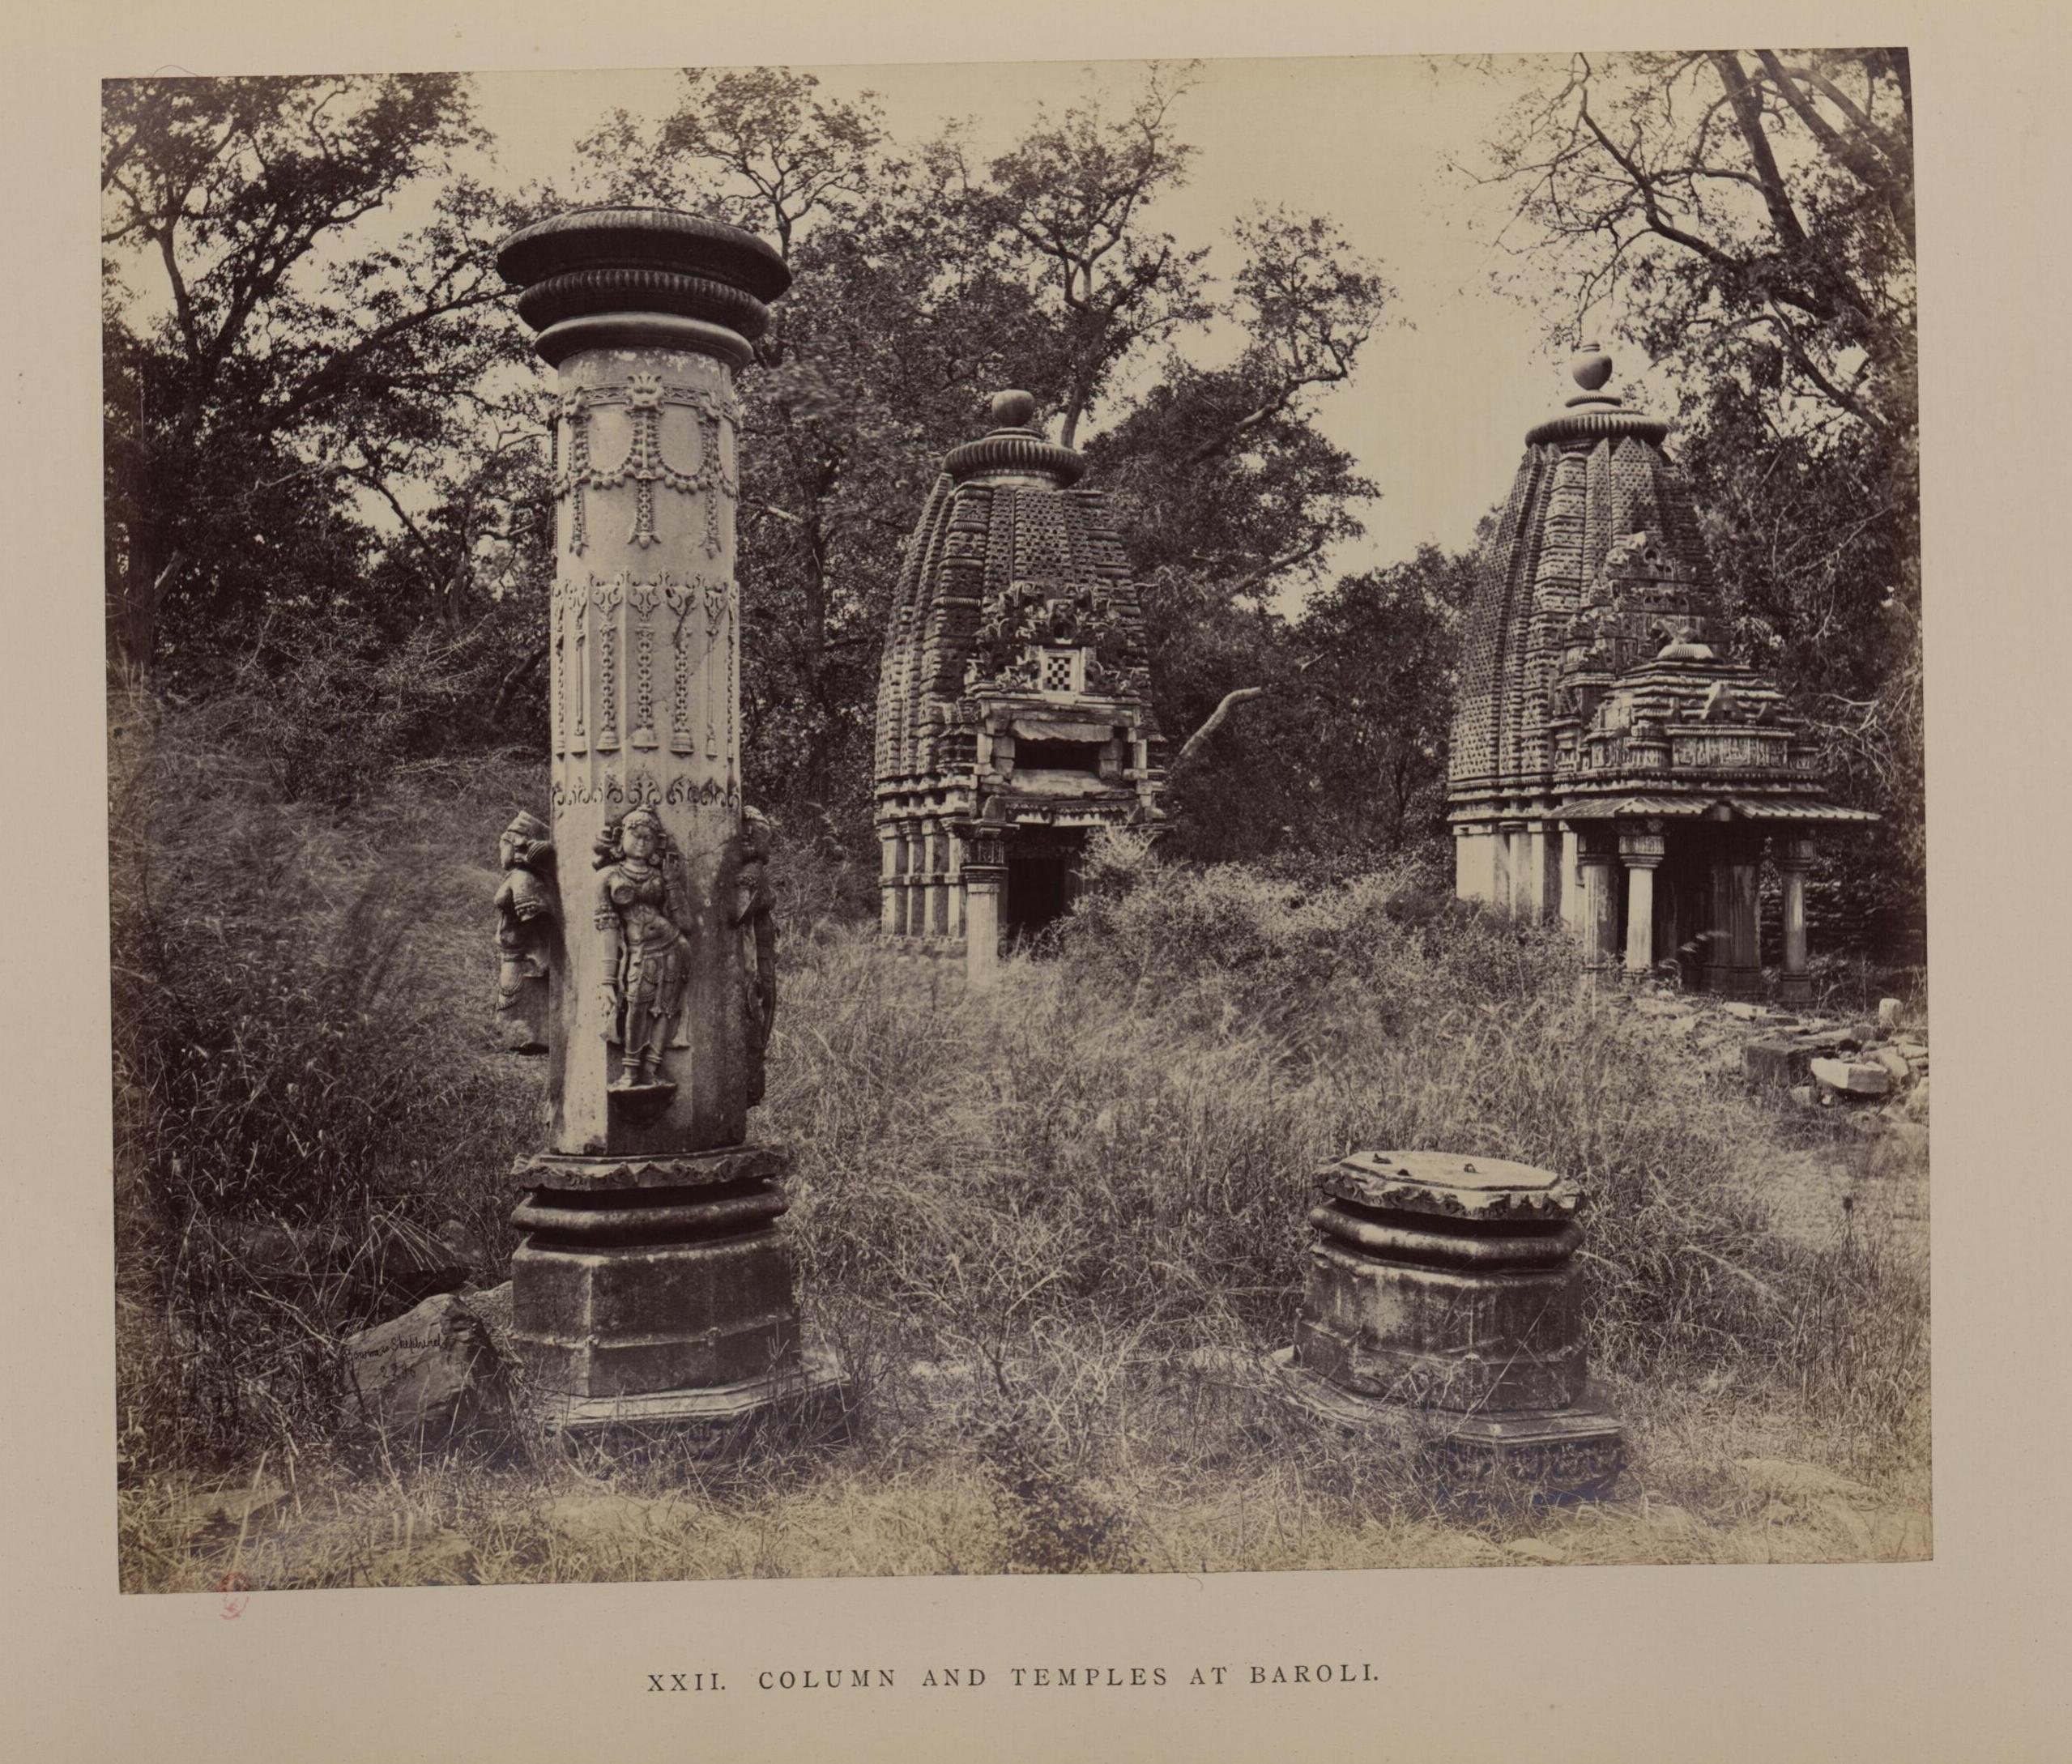 Бароли. Колонна и храмы